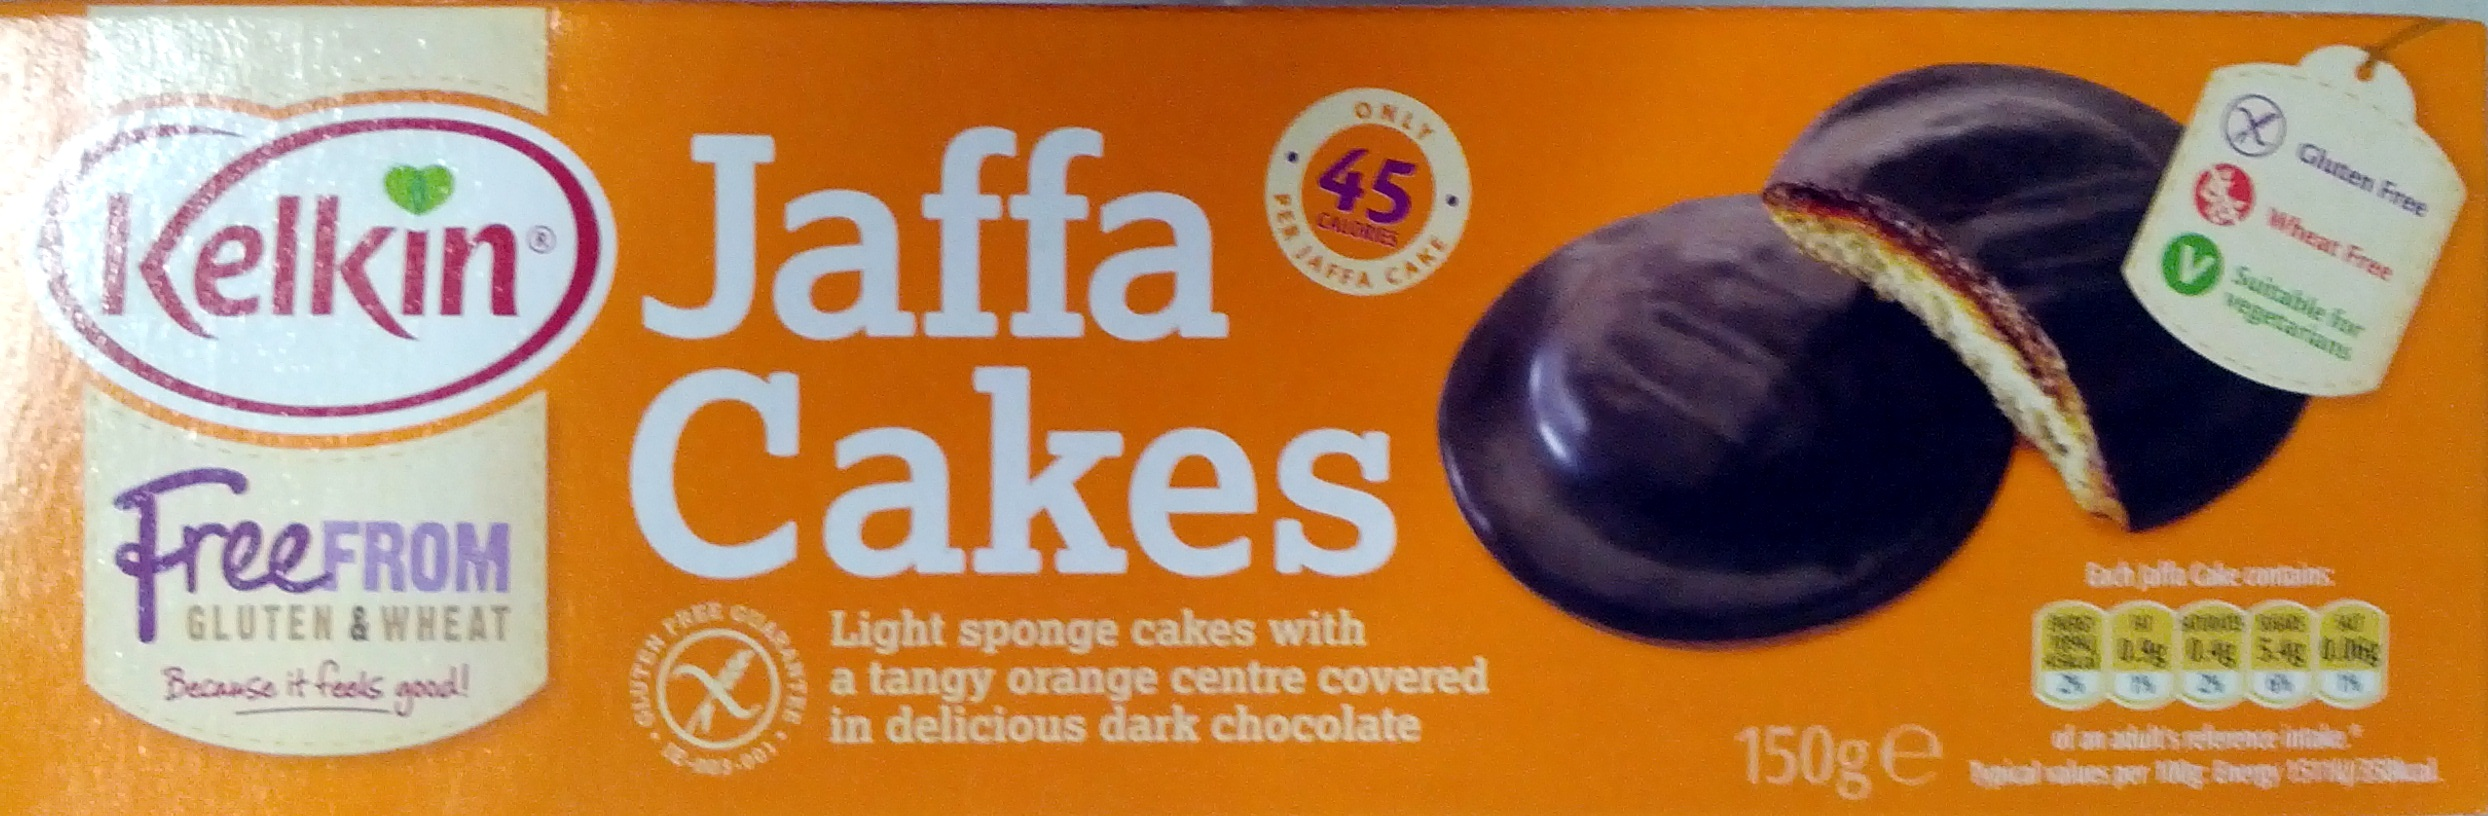 Gluten Free Jaffa Cakes - Product